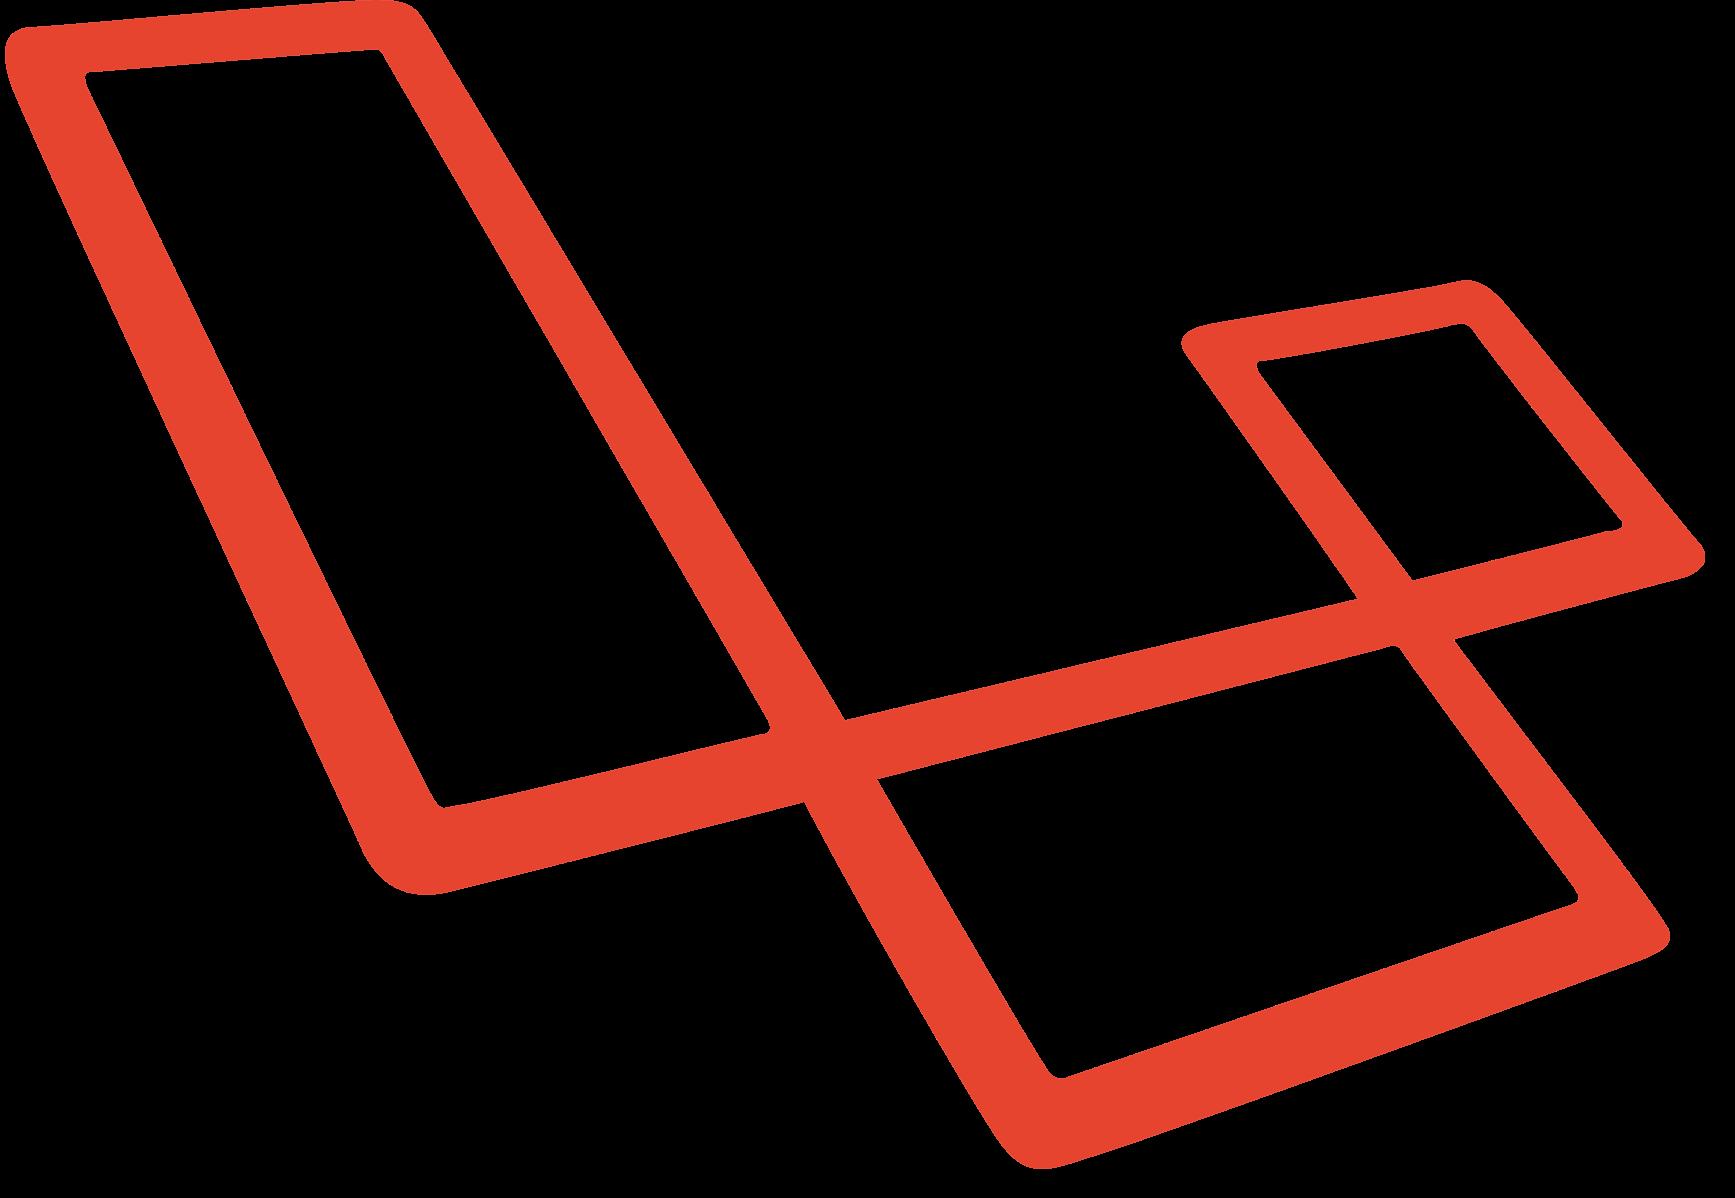 Laravel 5.7 - Quoi de neuf à l'horizon